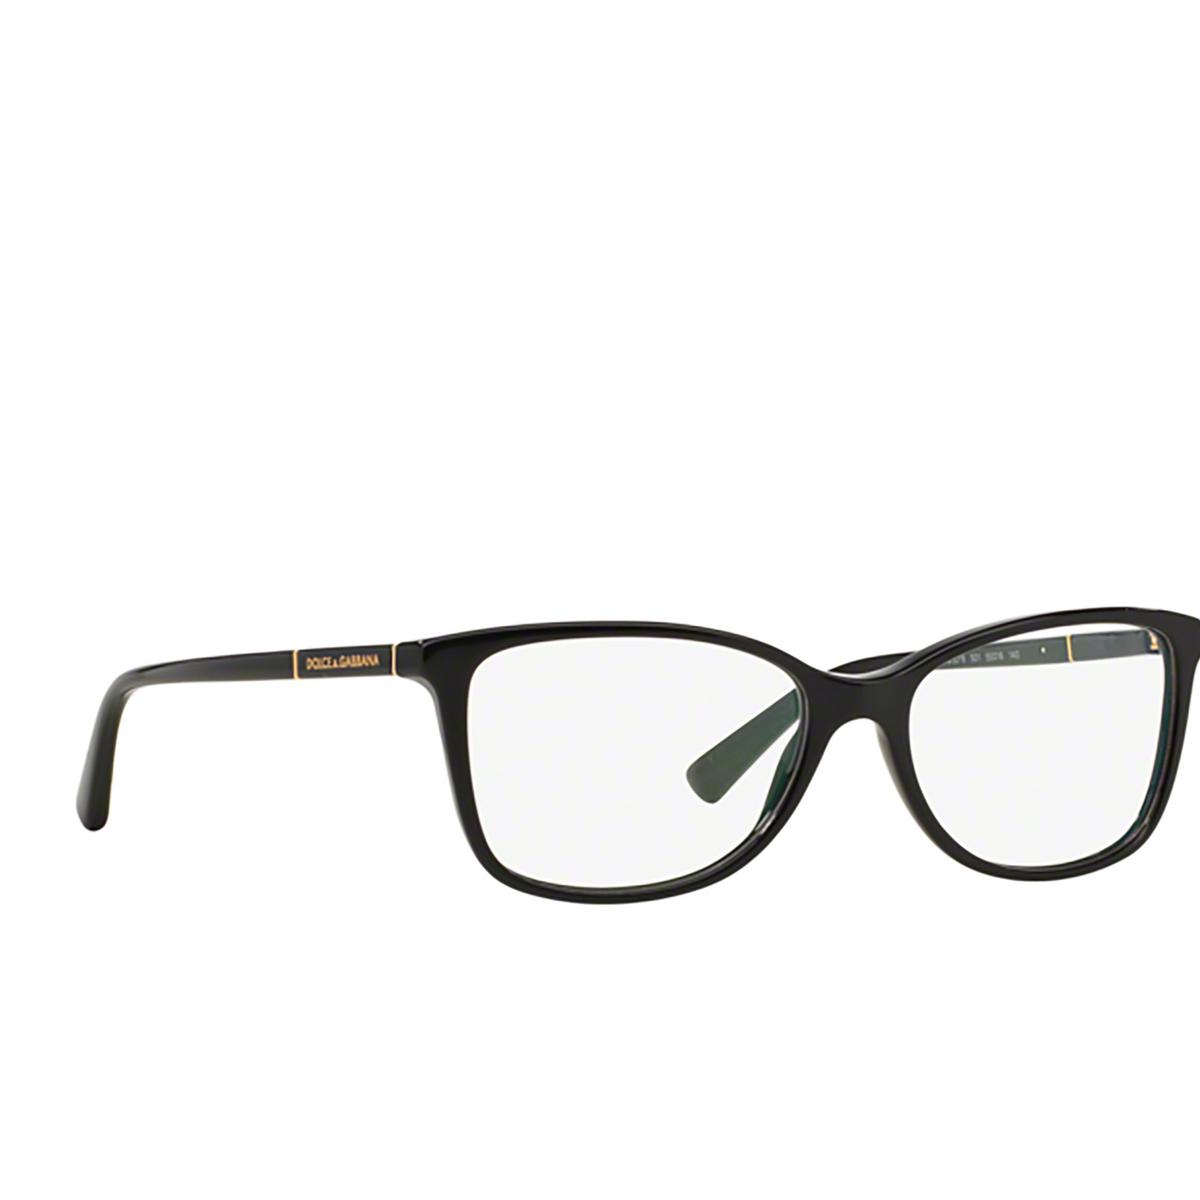 Dolce & Gabbana® Square Eyeglasses: DG3219 color Black 501 - three-quarters view.